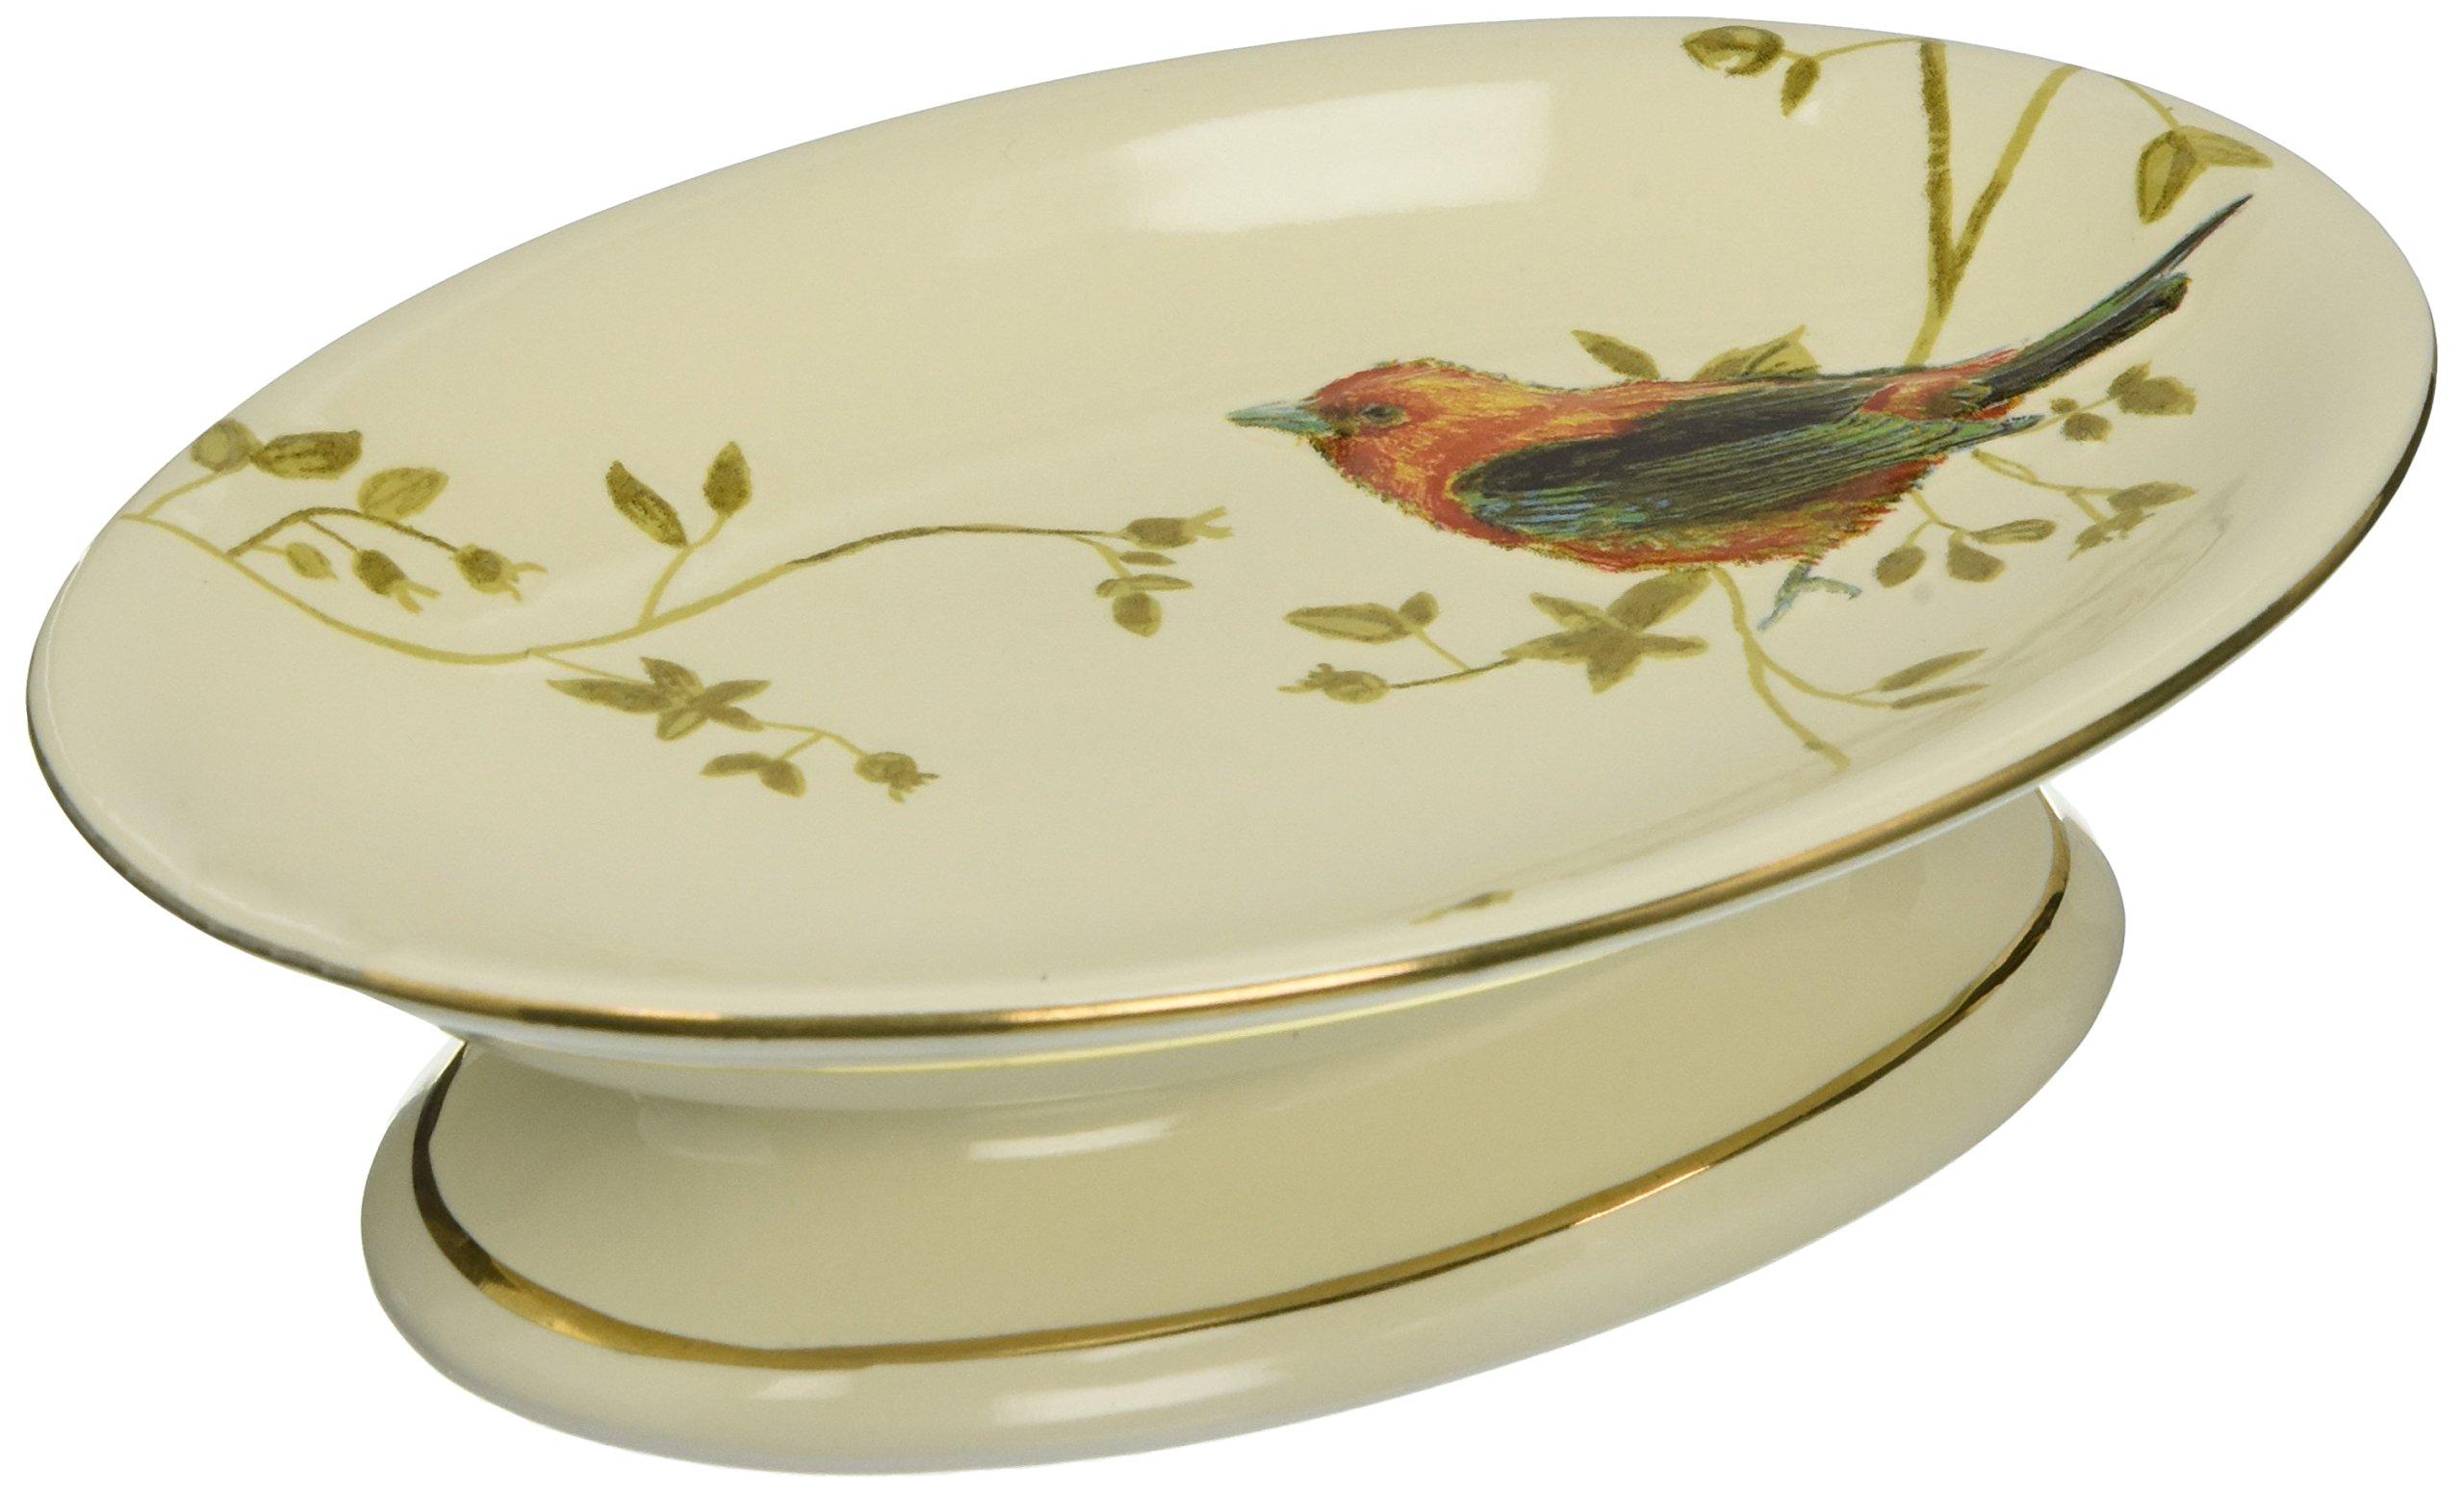 Avanti Linens Gilded Birds Soap Dish by Avanti Linens